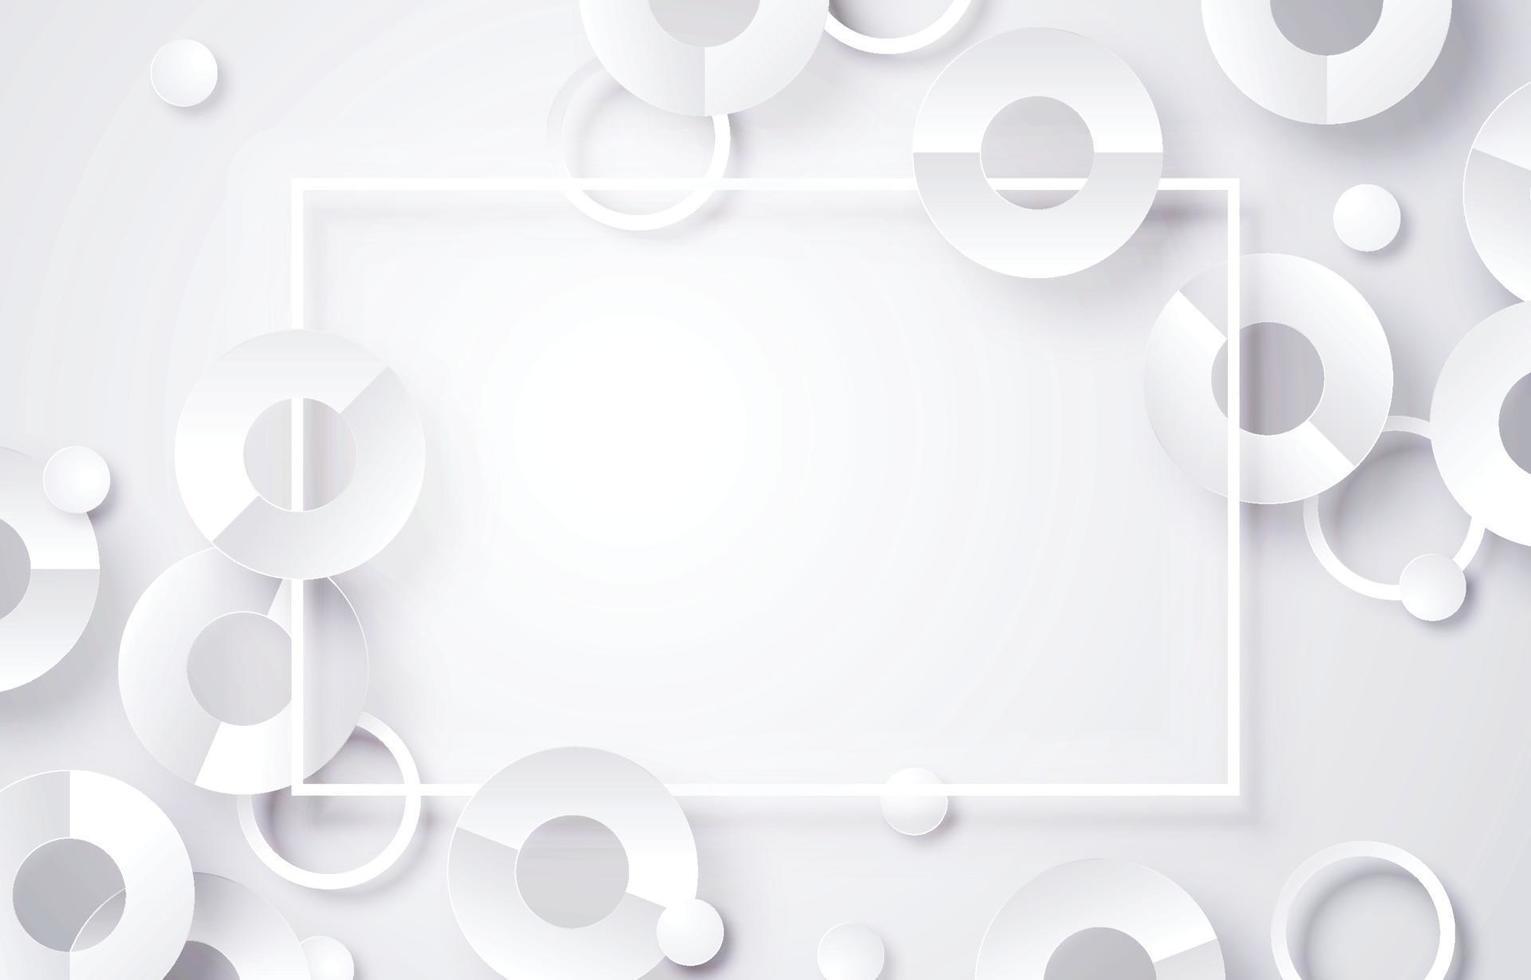 fondo abstracto marco blanco vector